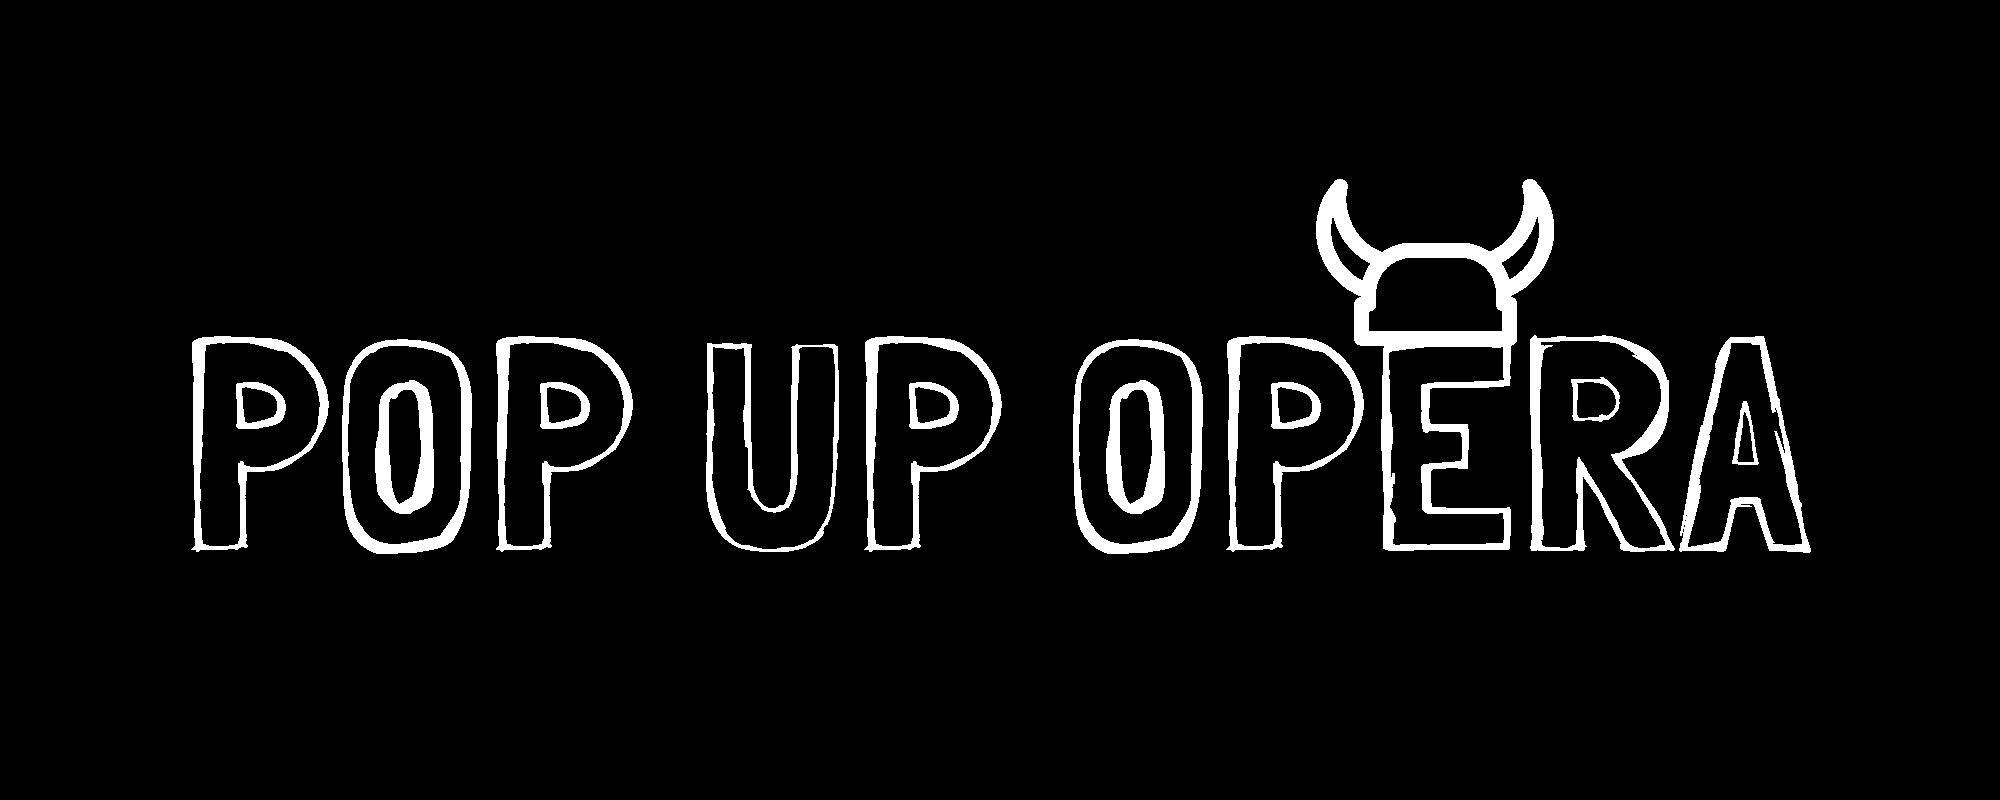 POP UP OPERA round 3.png